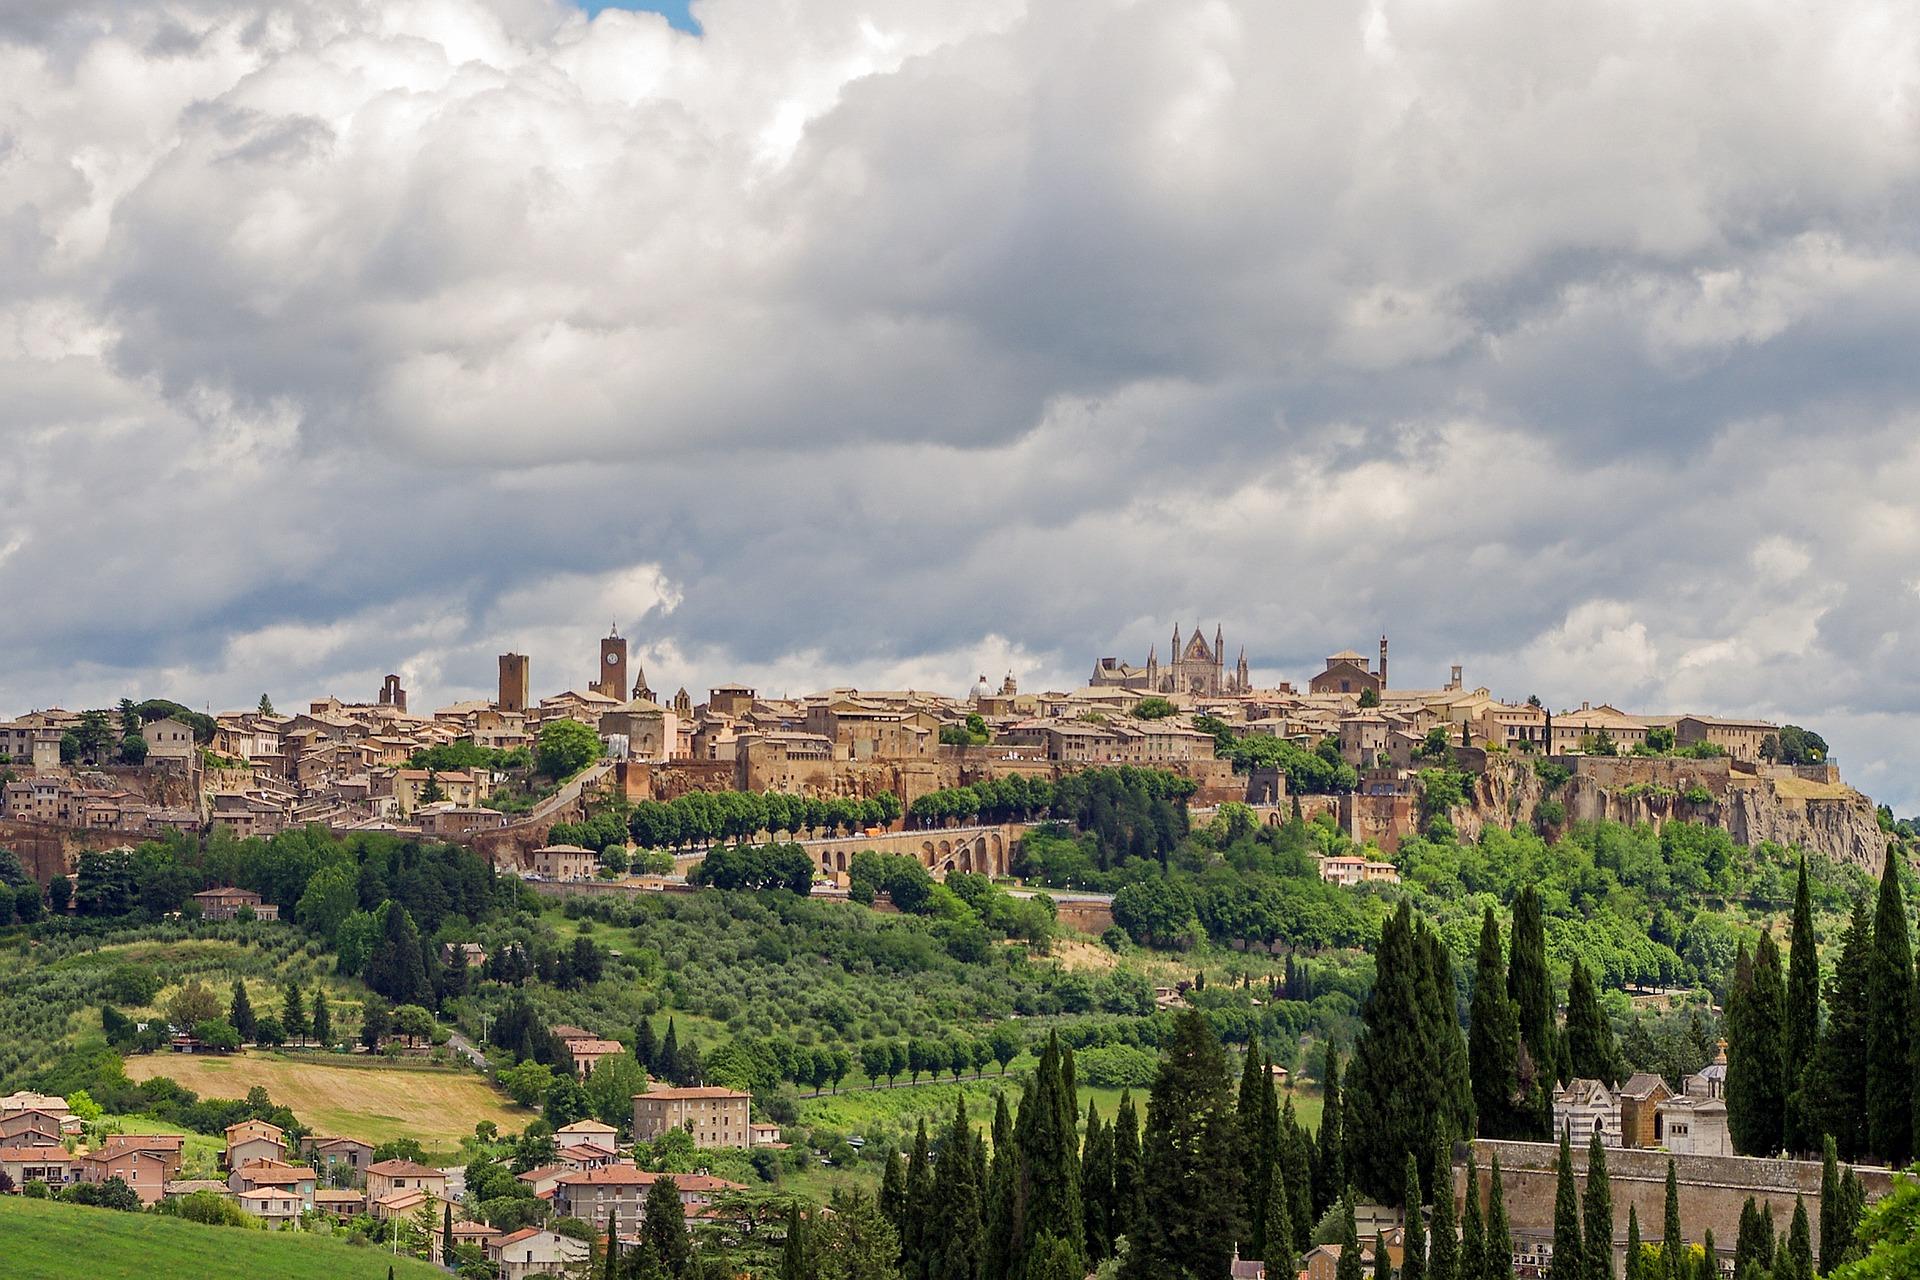 Orvieto landscape in Umbria